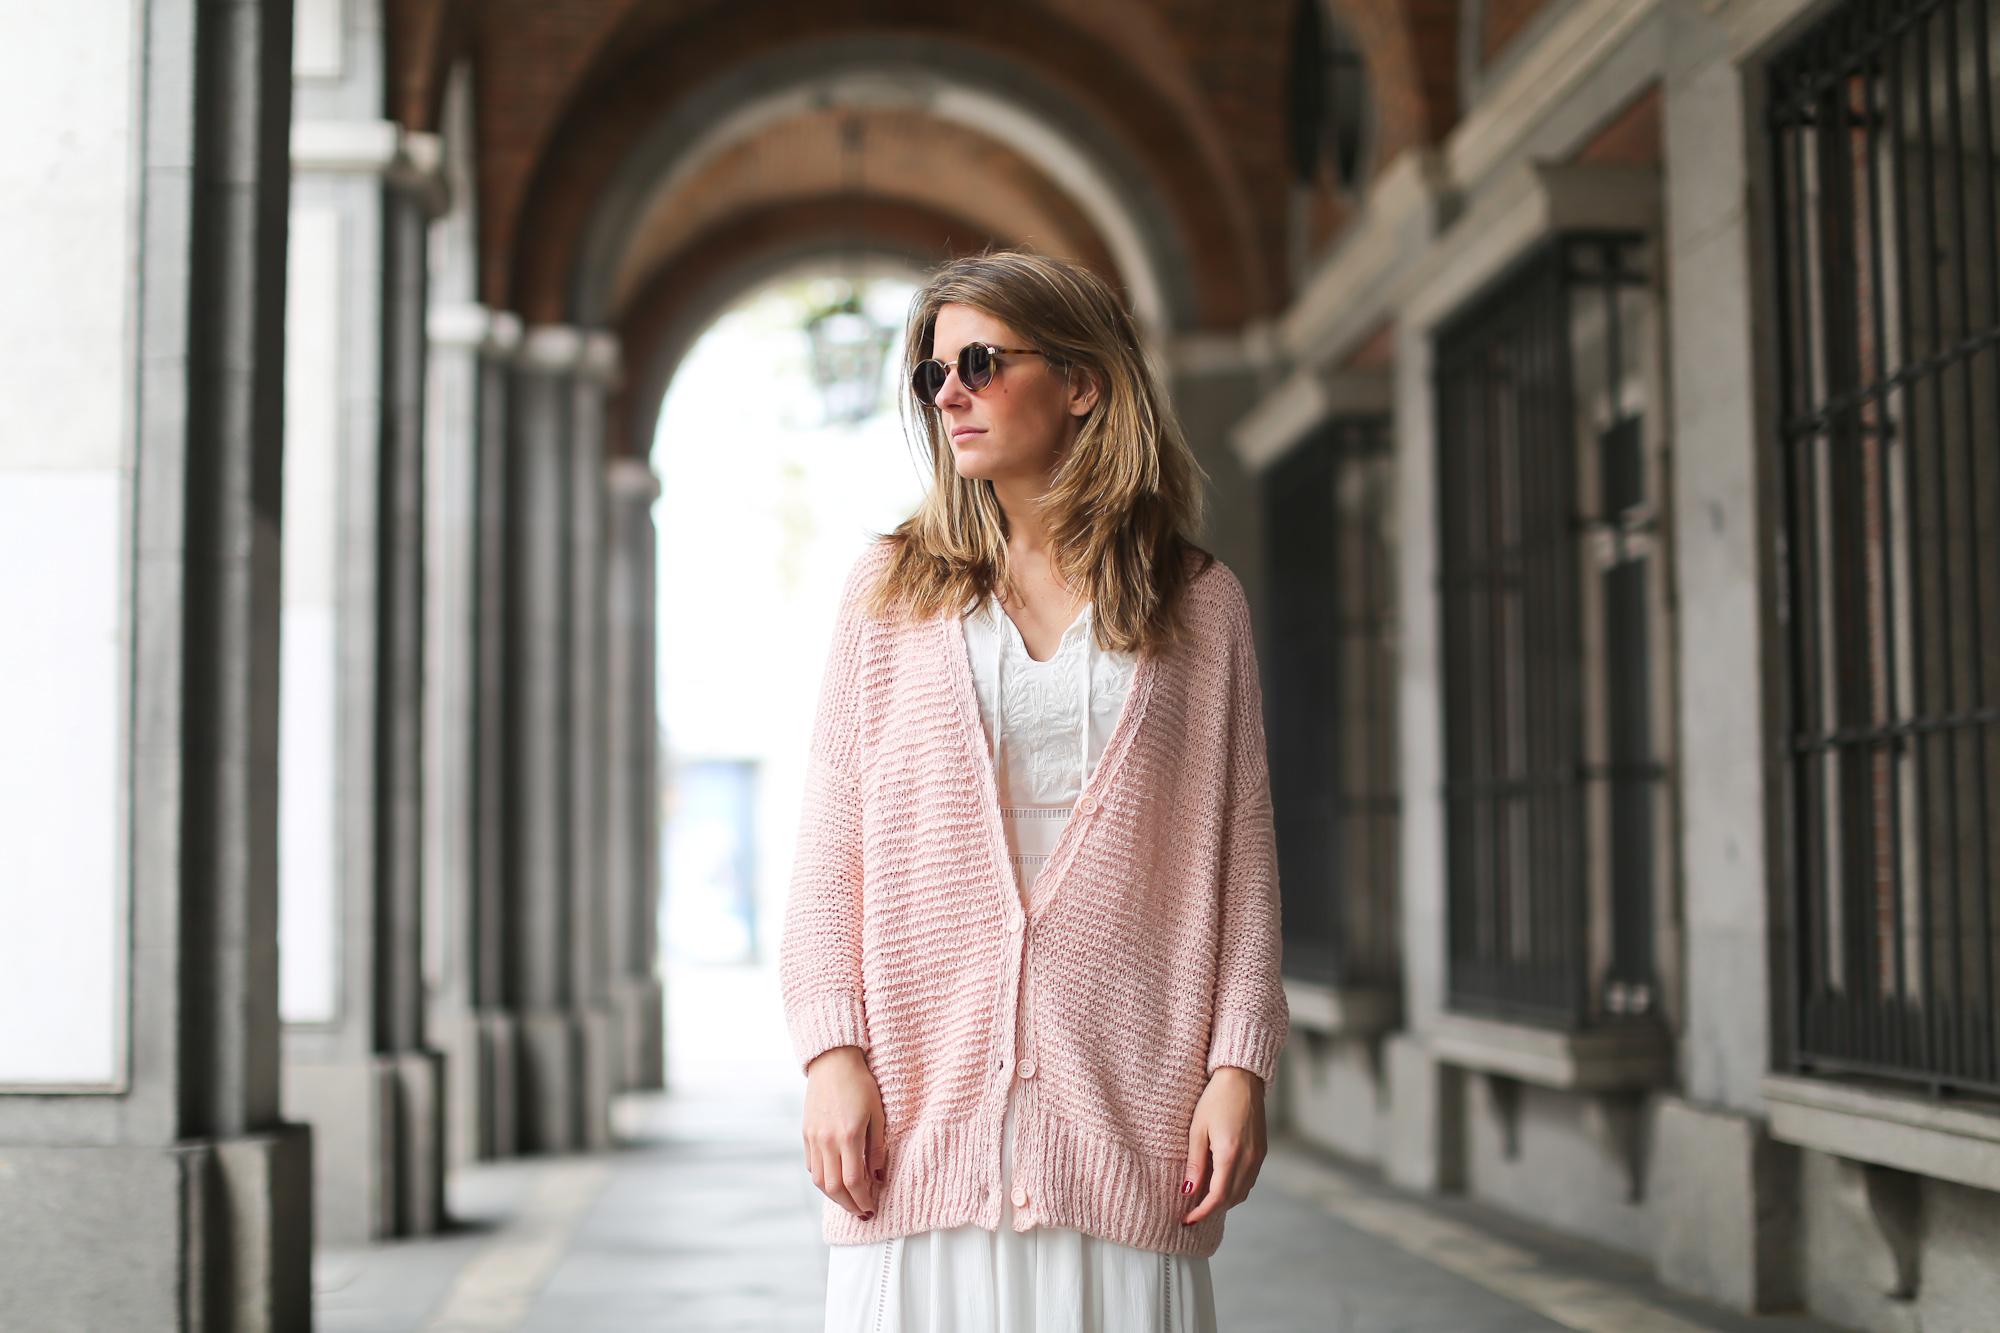 Clochet_streetstyle_lookiero_americanvintage_nude_cardigan_vila_white_boho_Dress-2